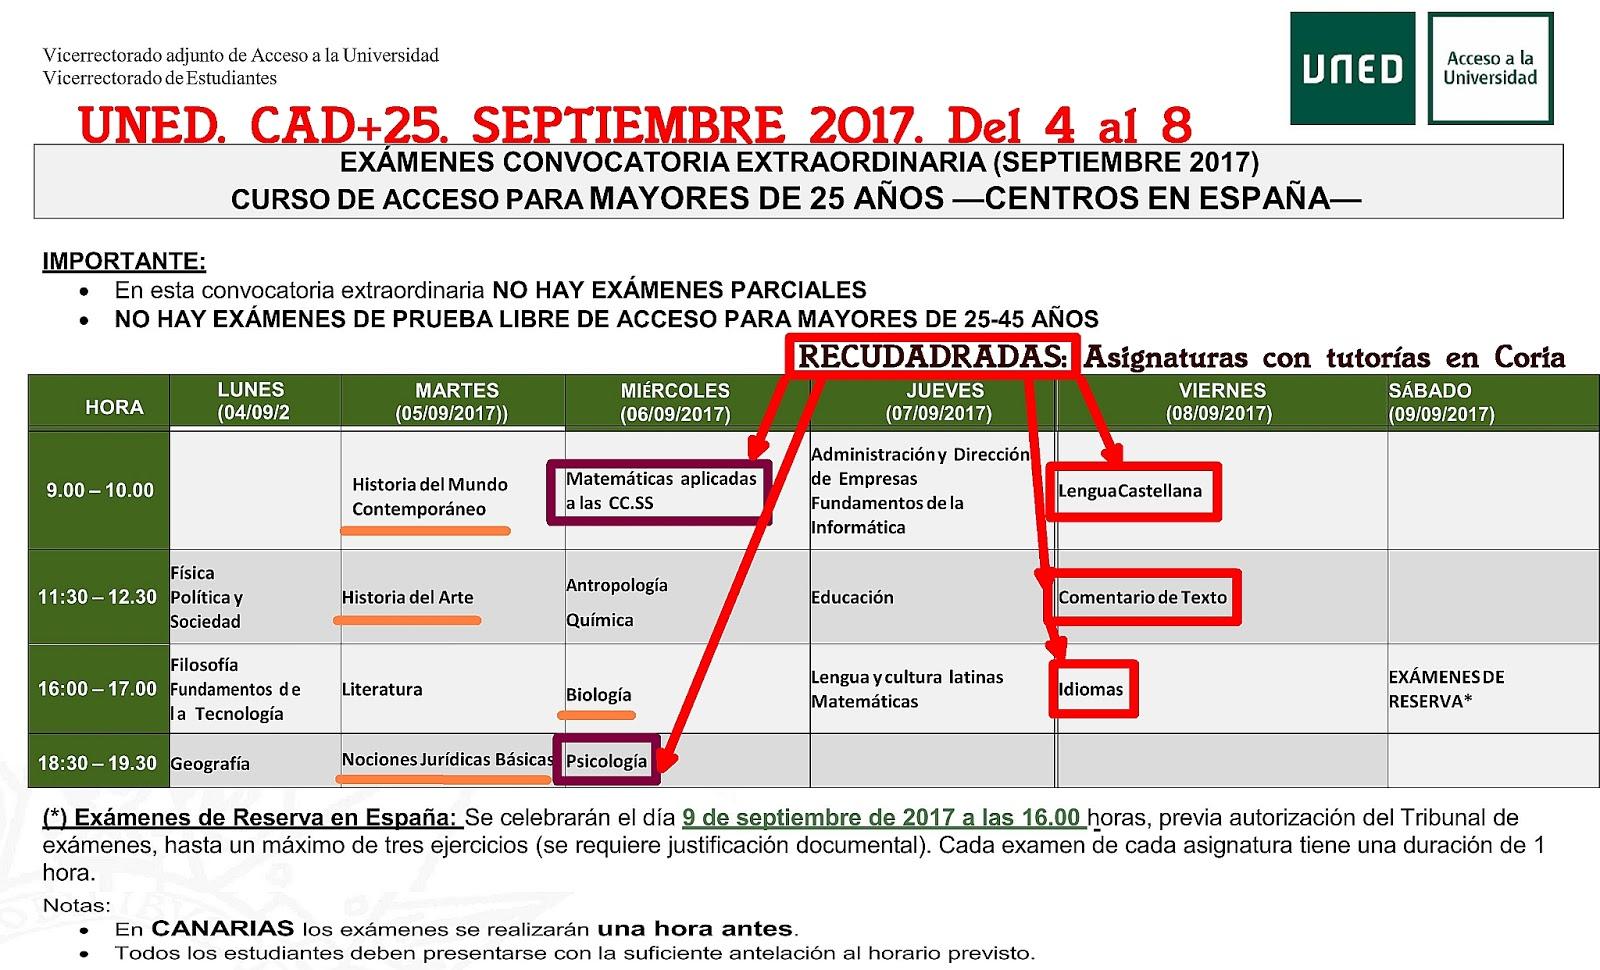 Uned Calendario Examenes.Uned Aula De Coria Caceres Calendario De Examenes